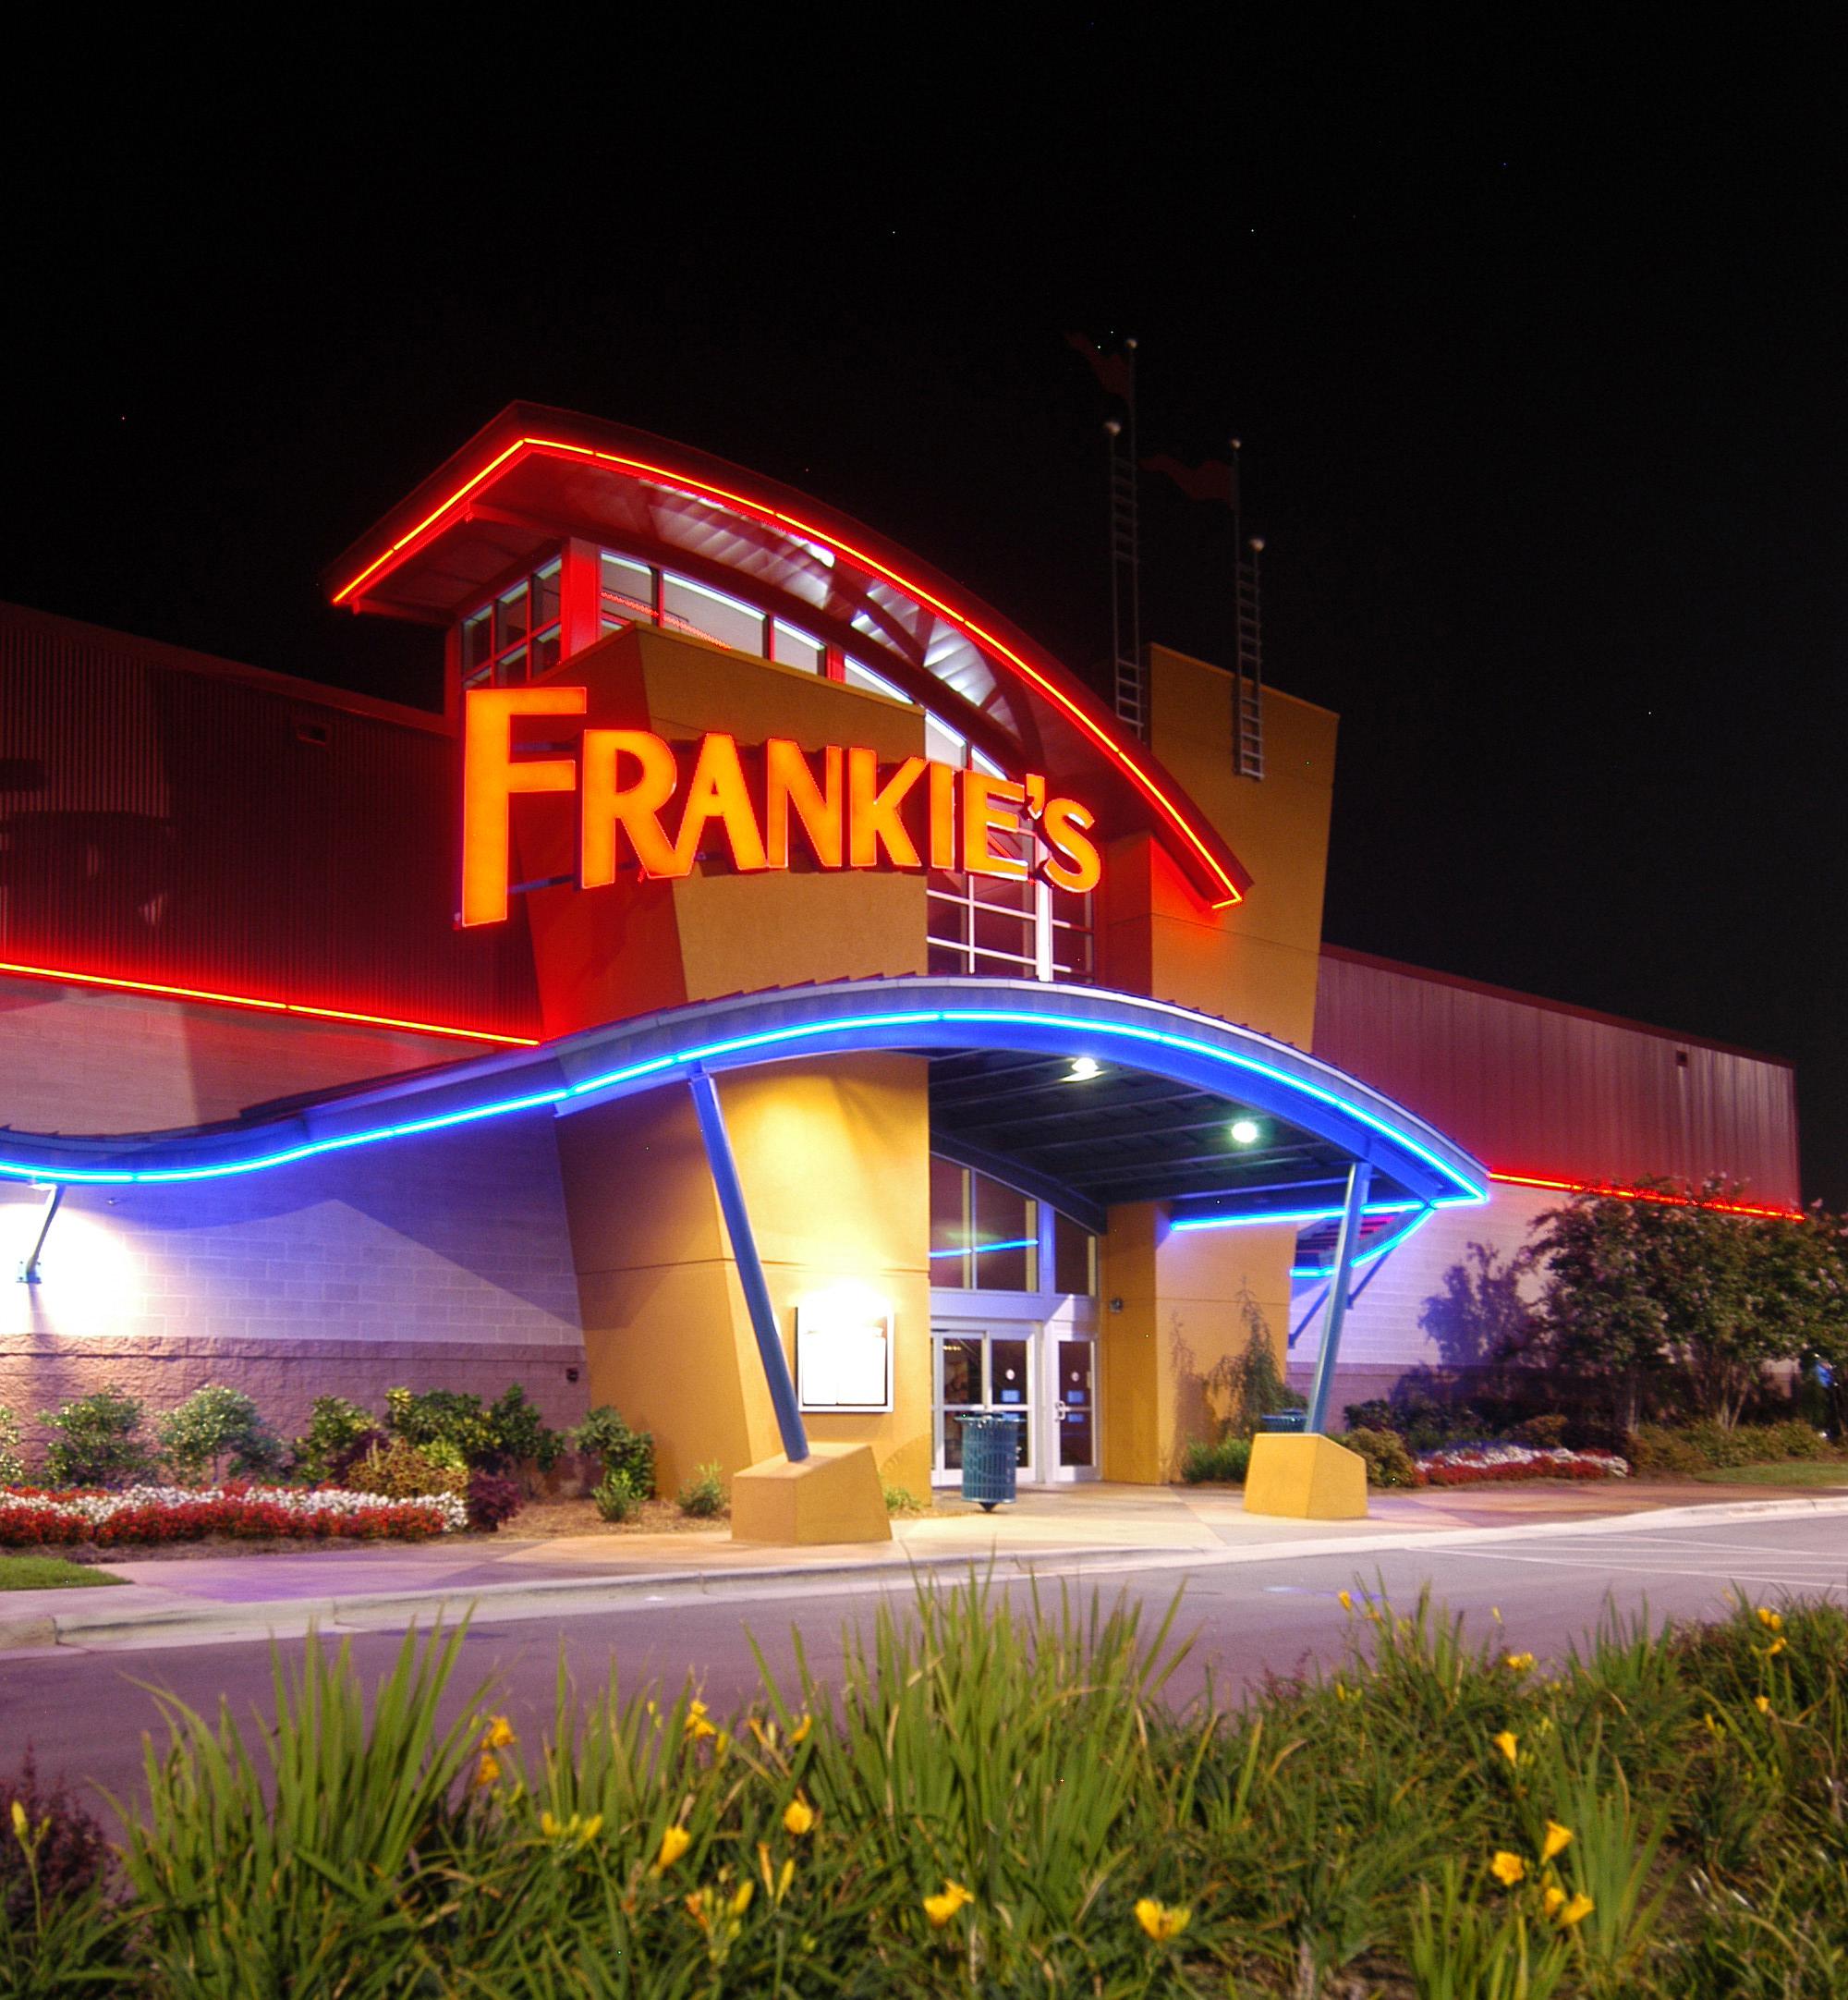 ADW-Entertainment-Frankie's-Fun-Park-Raleigh-NC-exterior.jpg